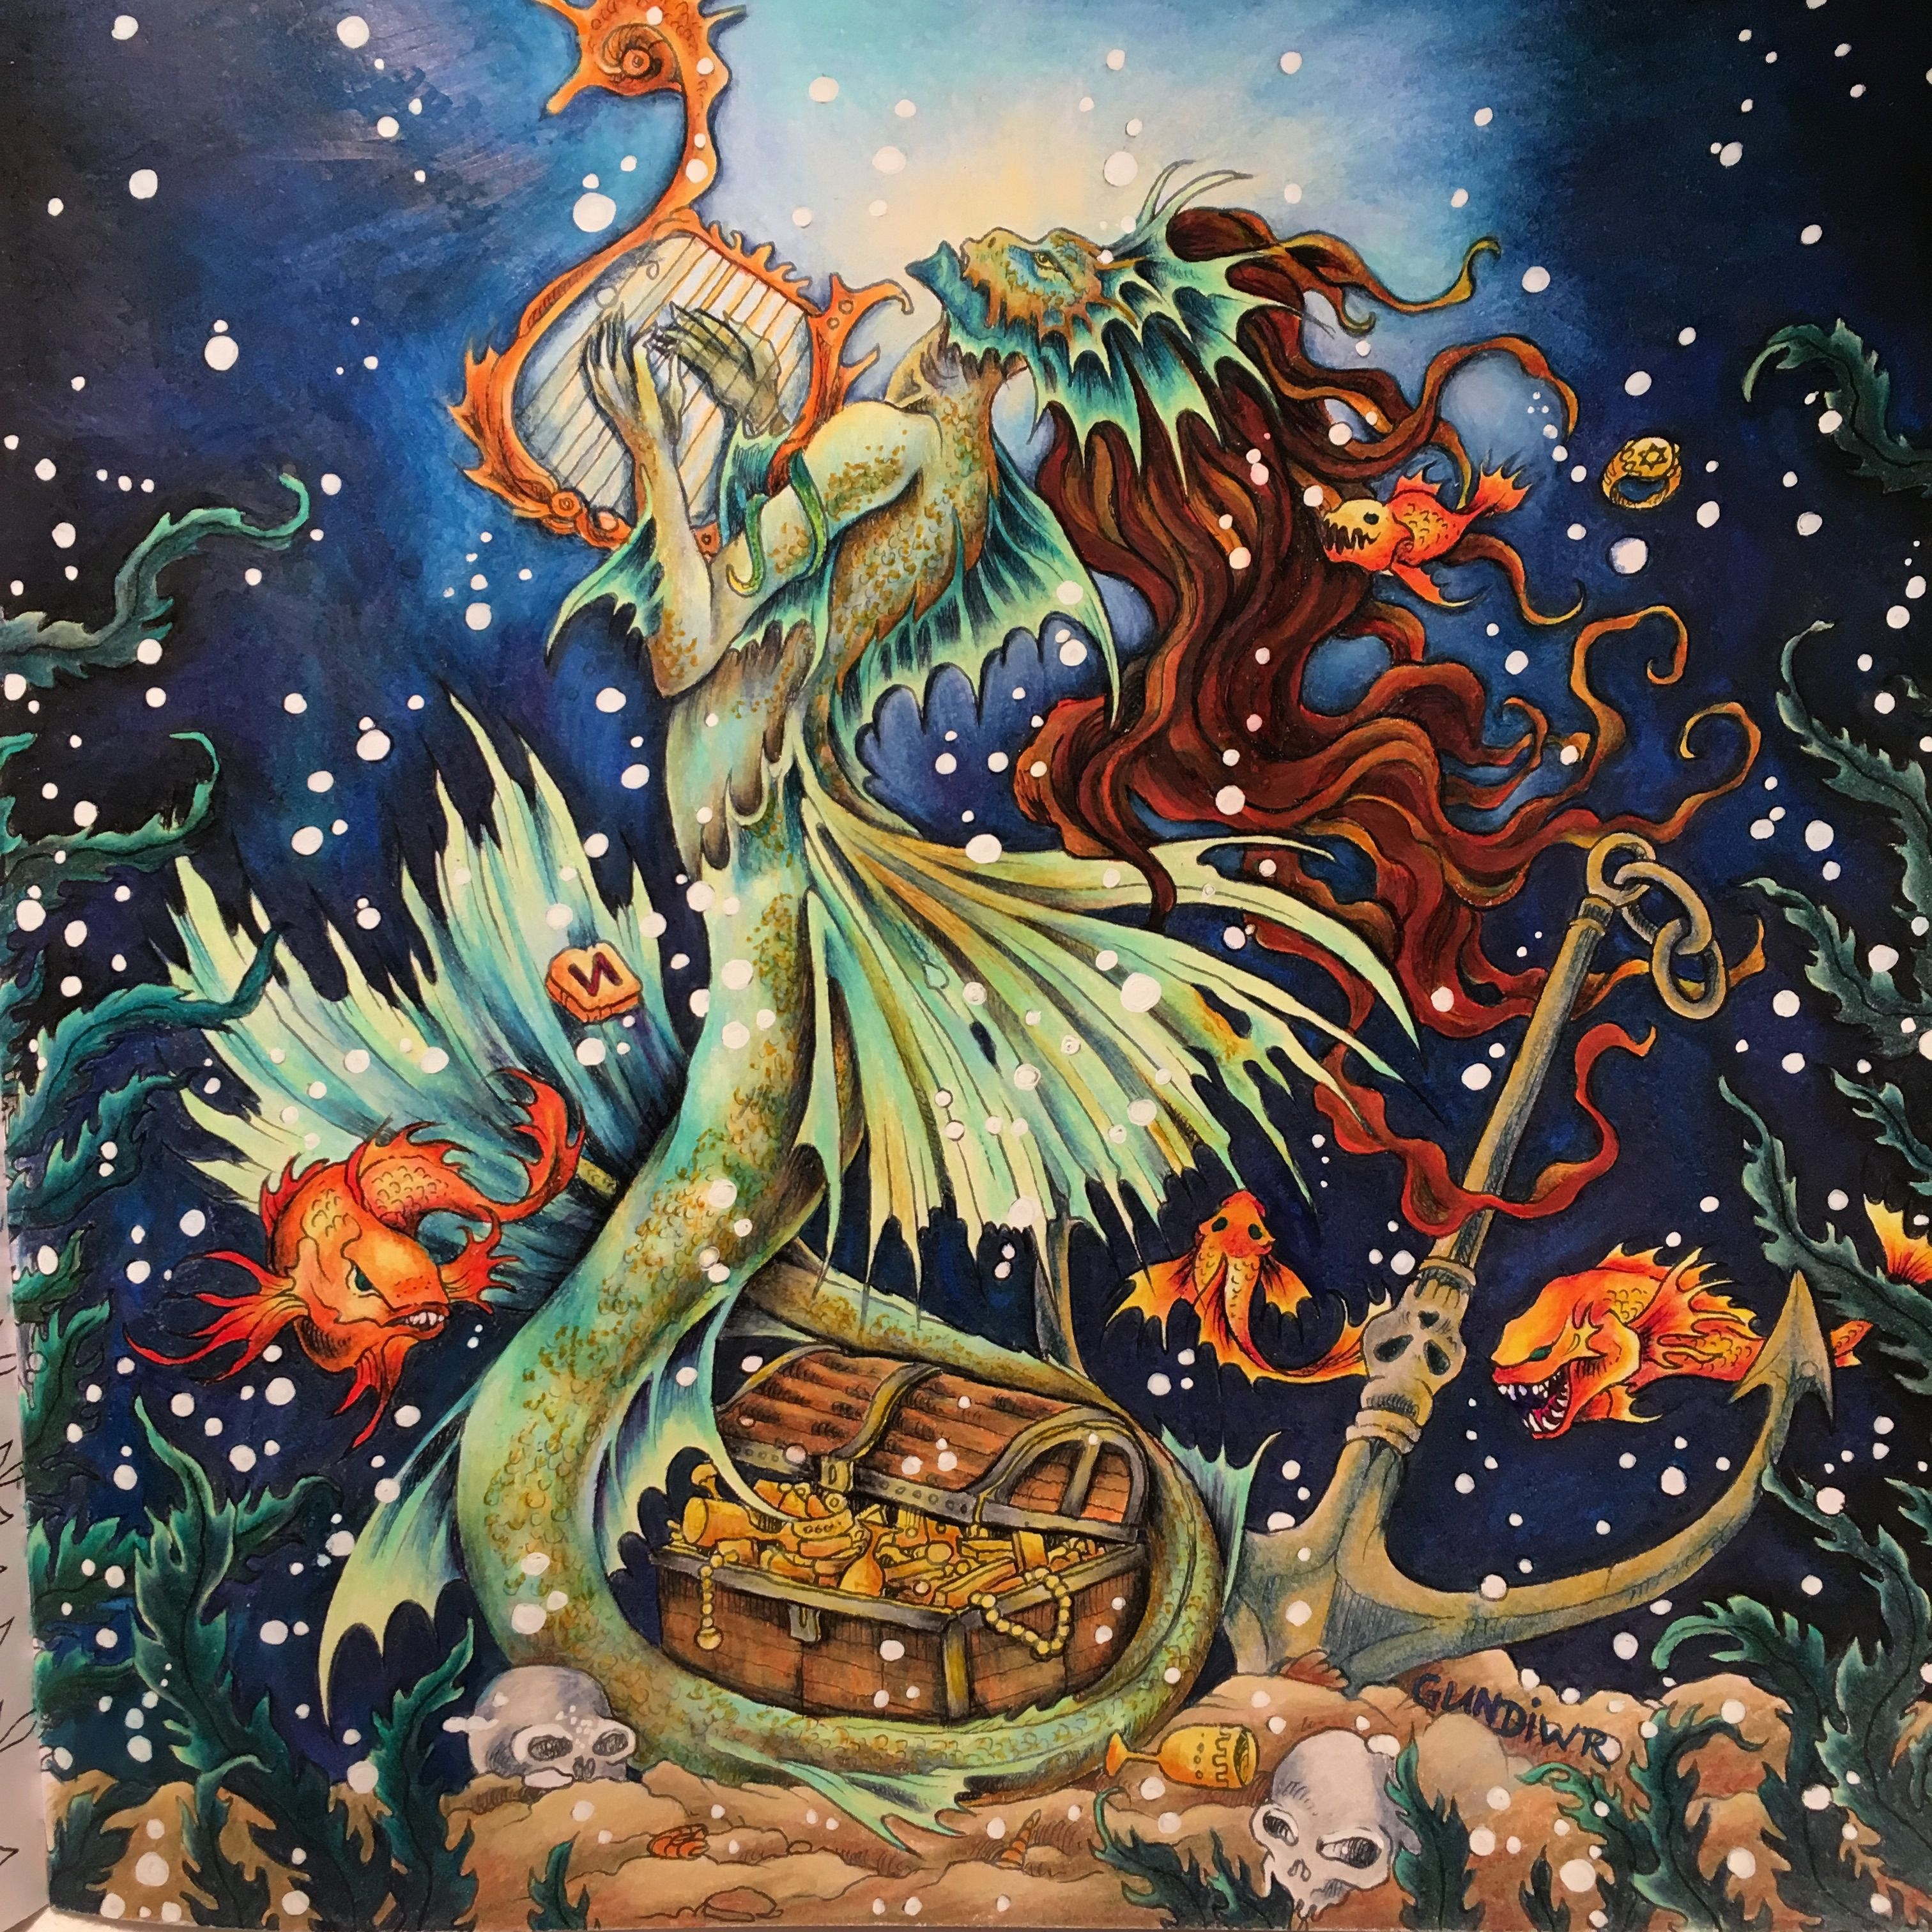 Mythomorphia Kerby Rosanes Coloring Books Coloring Book Art Animorphia Coloring Book